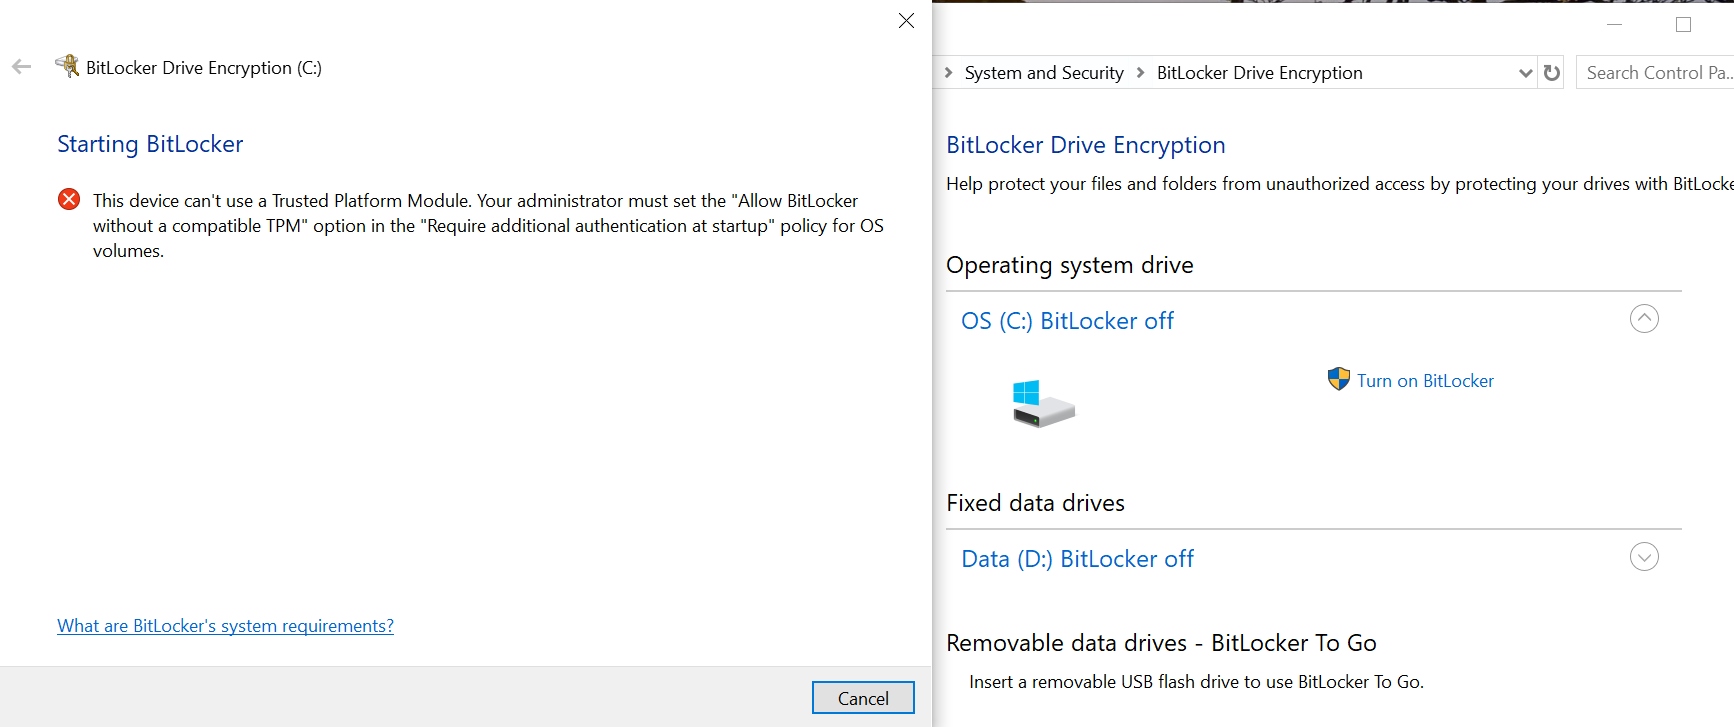 How to turn on the BitLocker? eefacb8c-cf9d-4f11-bac4-48a75246ddc0?upload=true.png